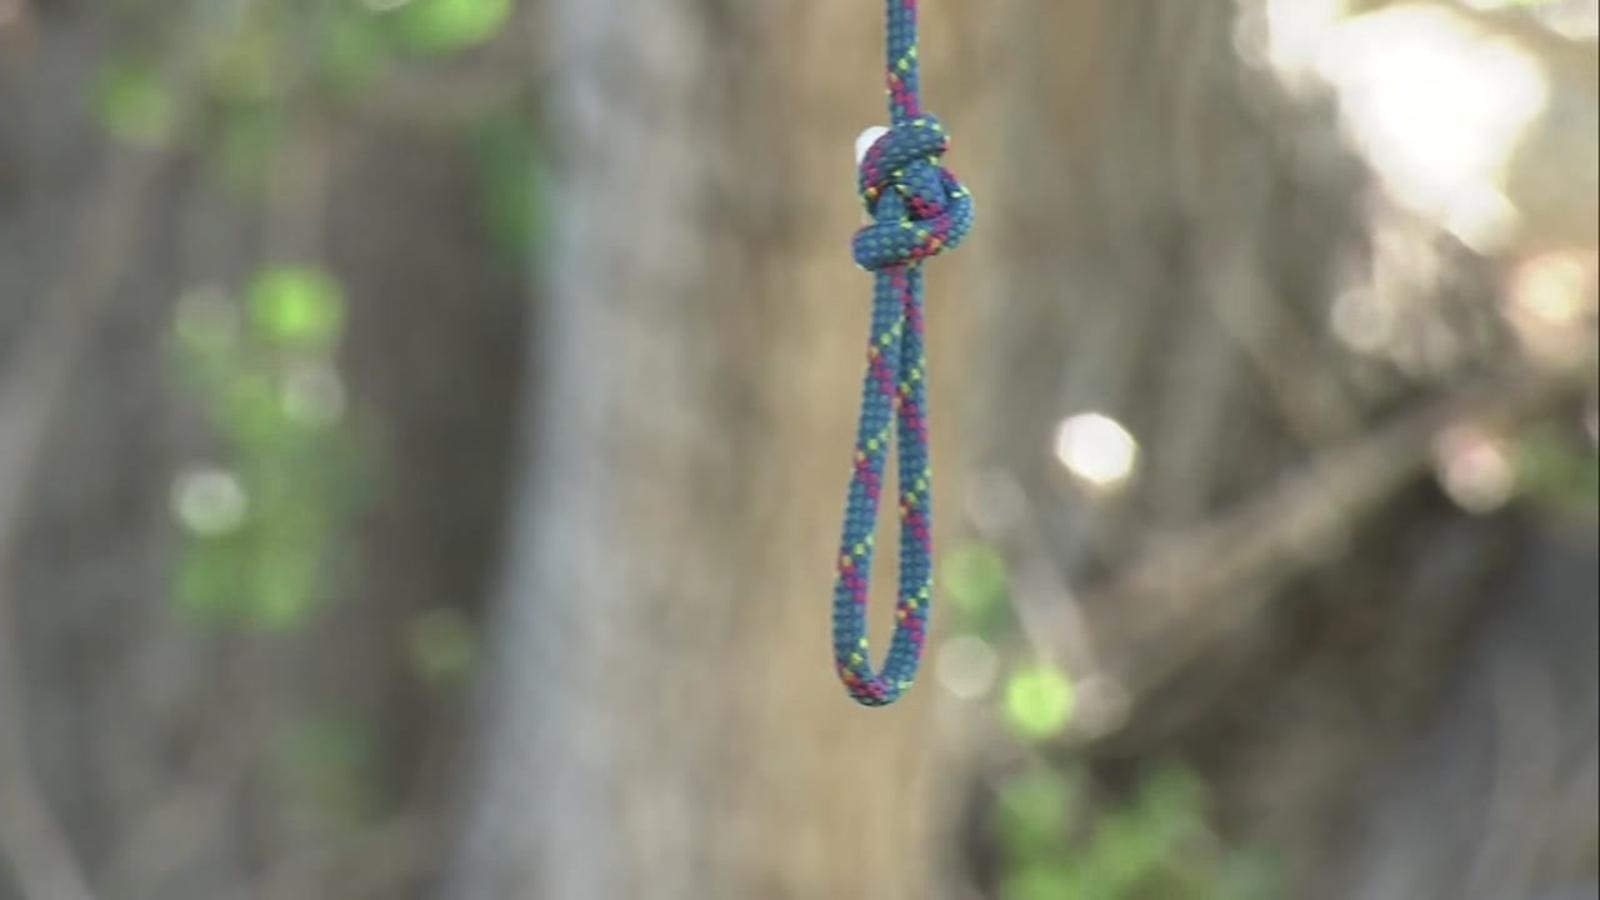 6253292 062720 kgo rope hanging lake merritt img Image 15 38 07,29 jpg?w=1600.'